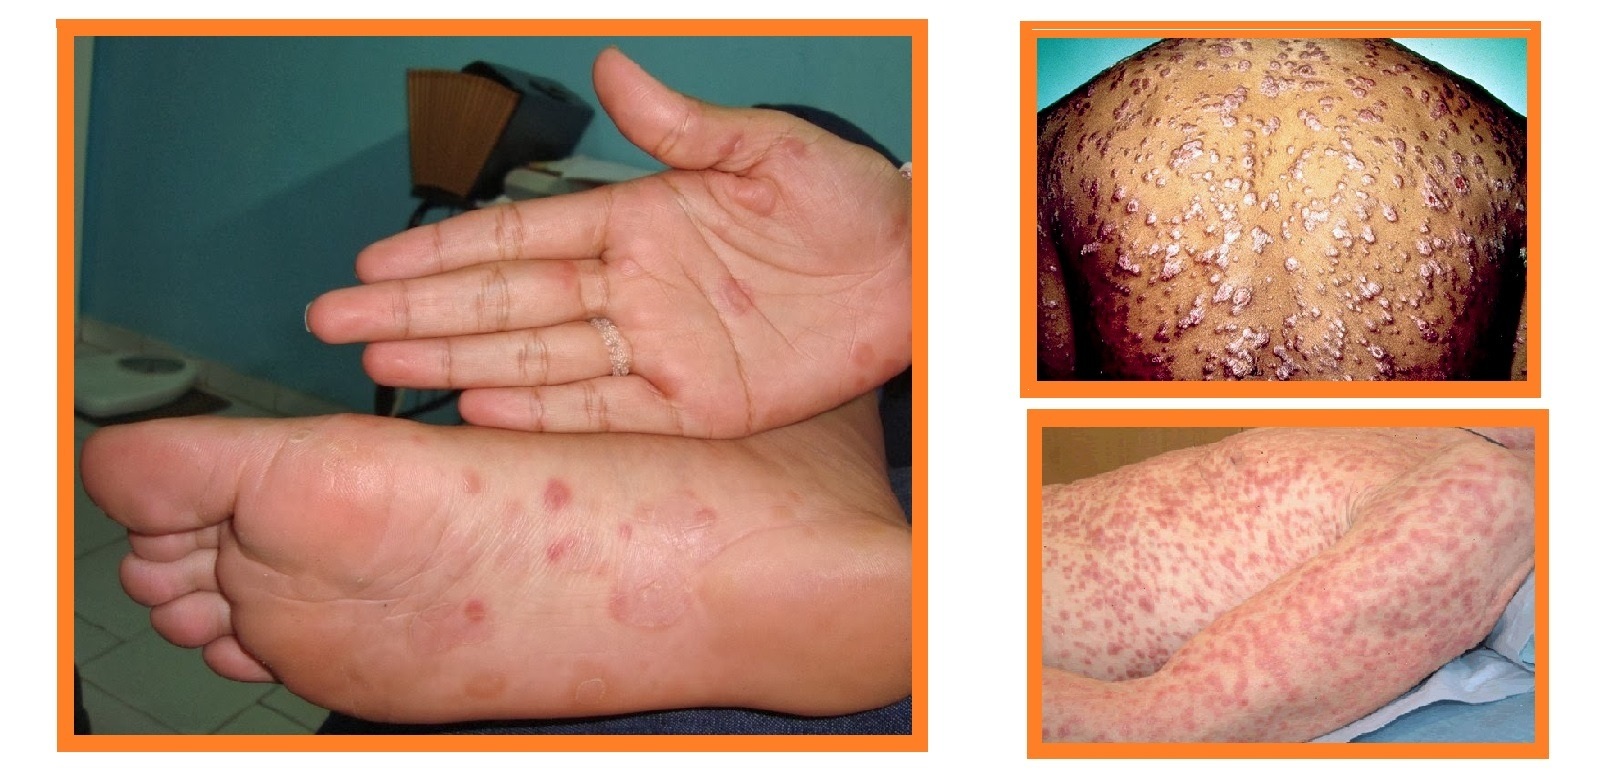 Lesões cutâneas - Sífilis secundária